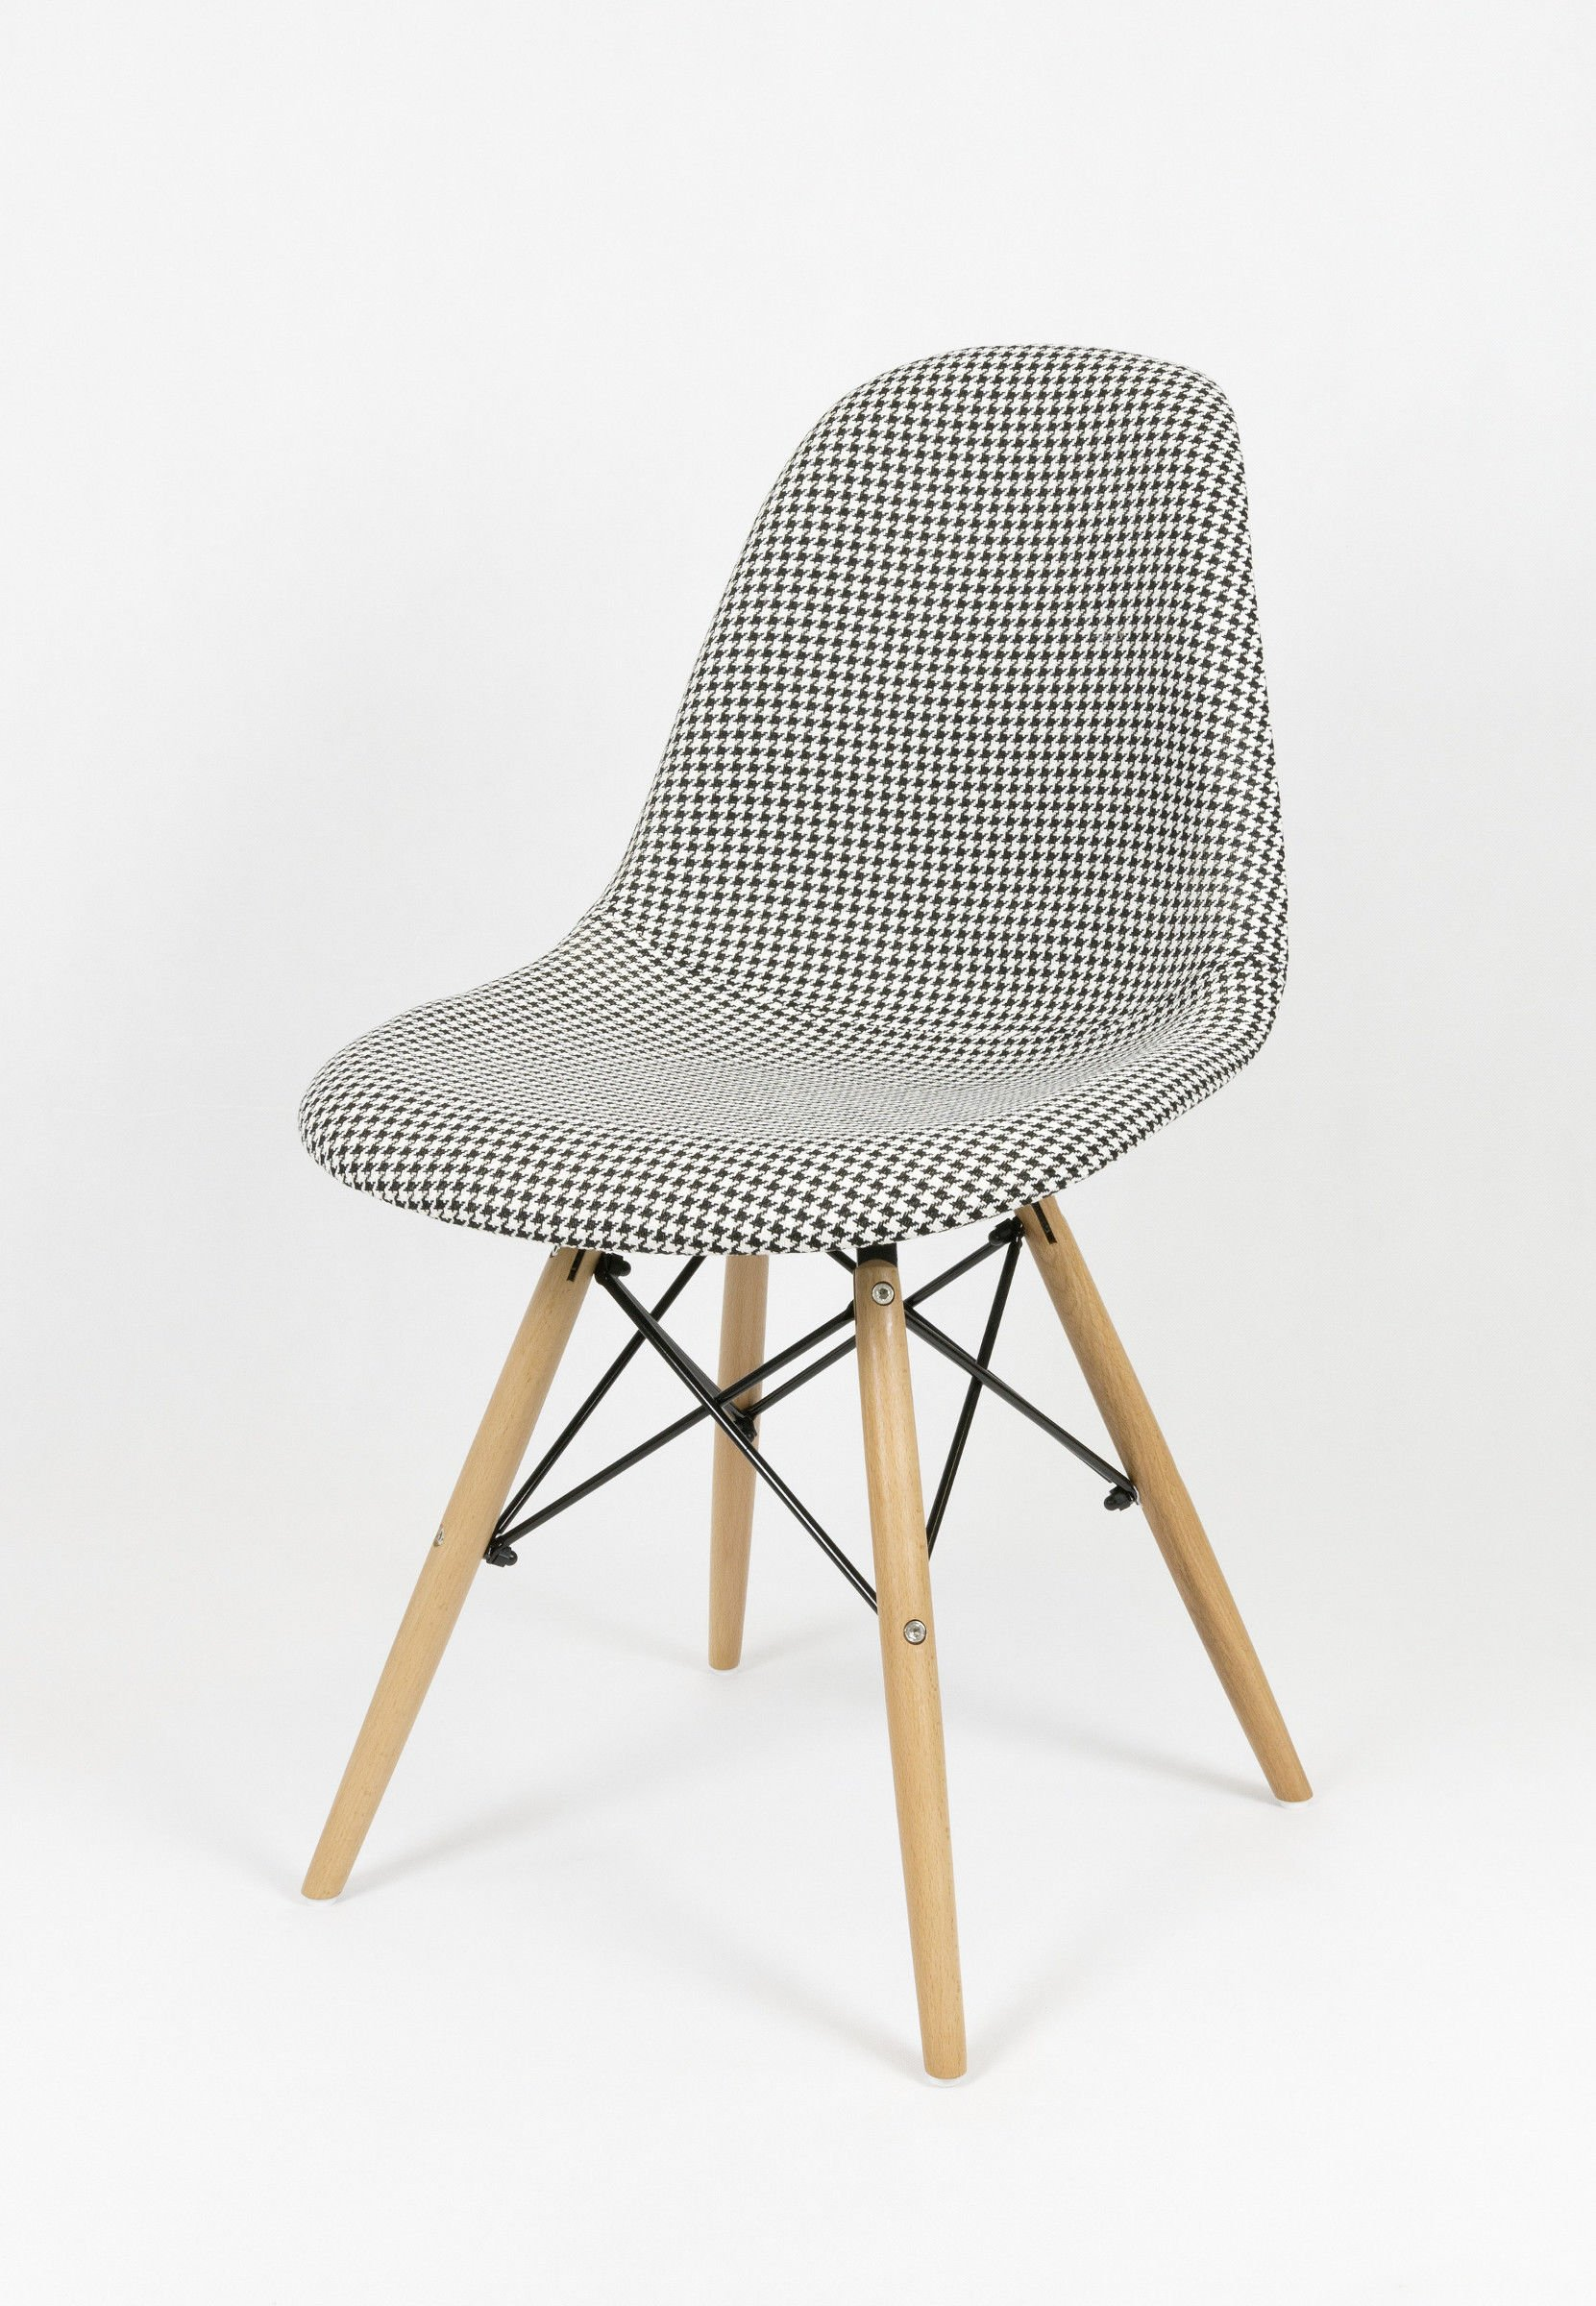 Góra SK Design KR012 Tapicerowane Krzesło Pepitka Buk PEPITKA \ Drewno WB51